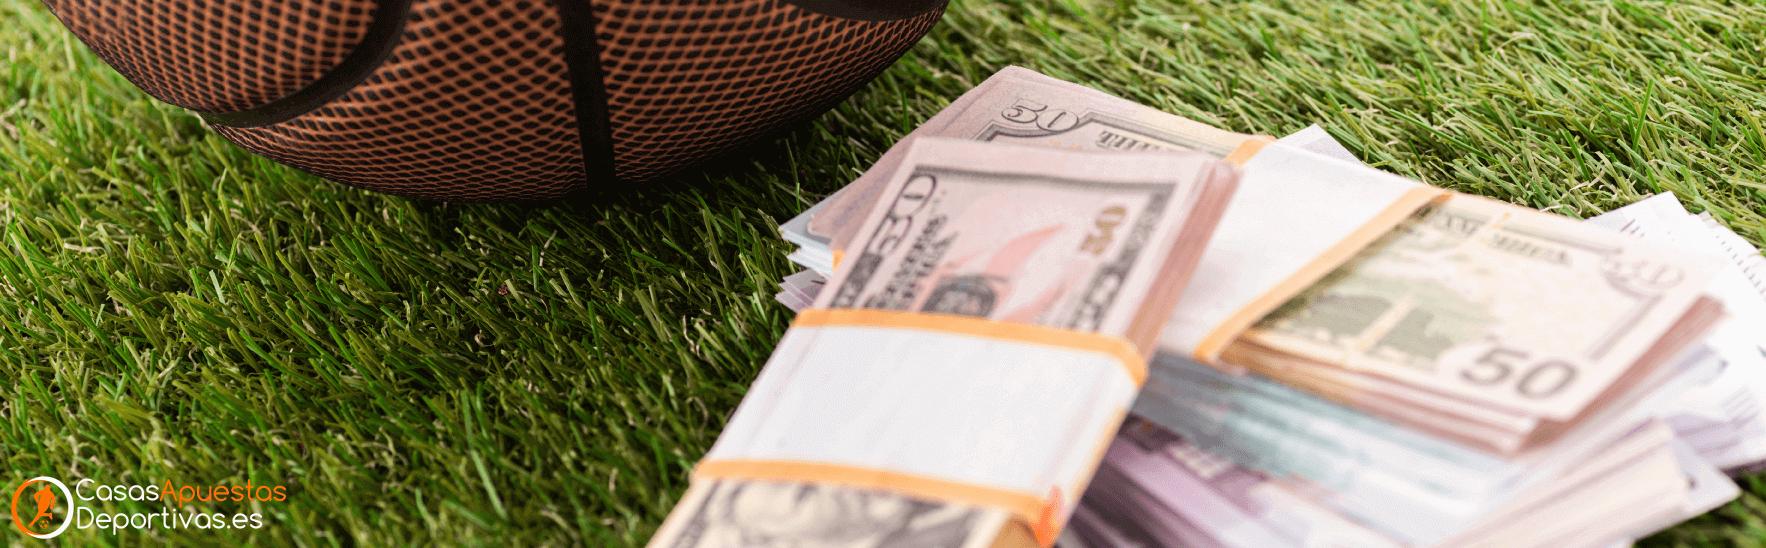 Estretegia Patent para apuestas deportivas en linea